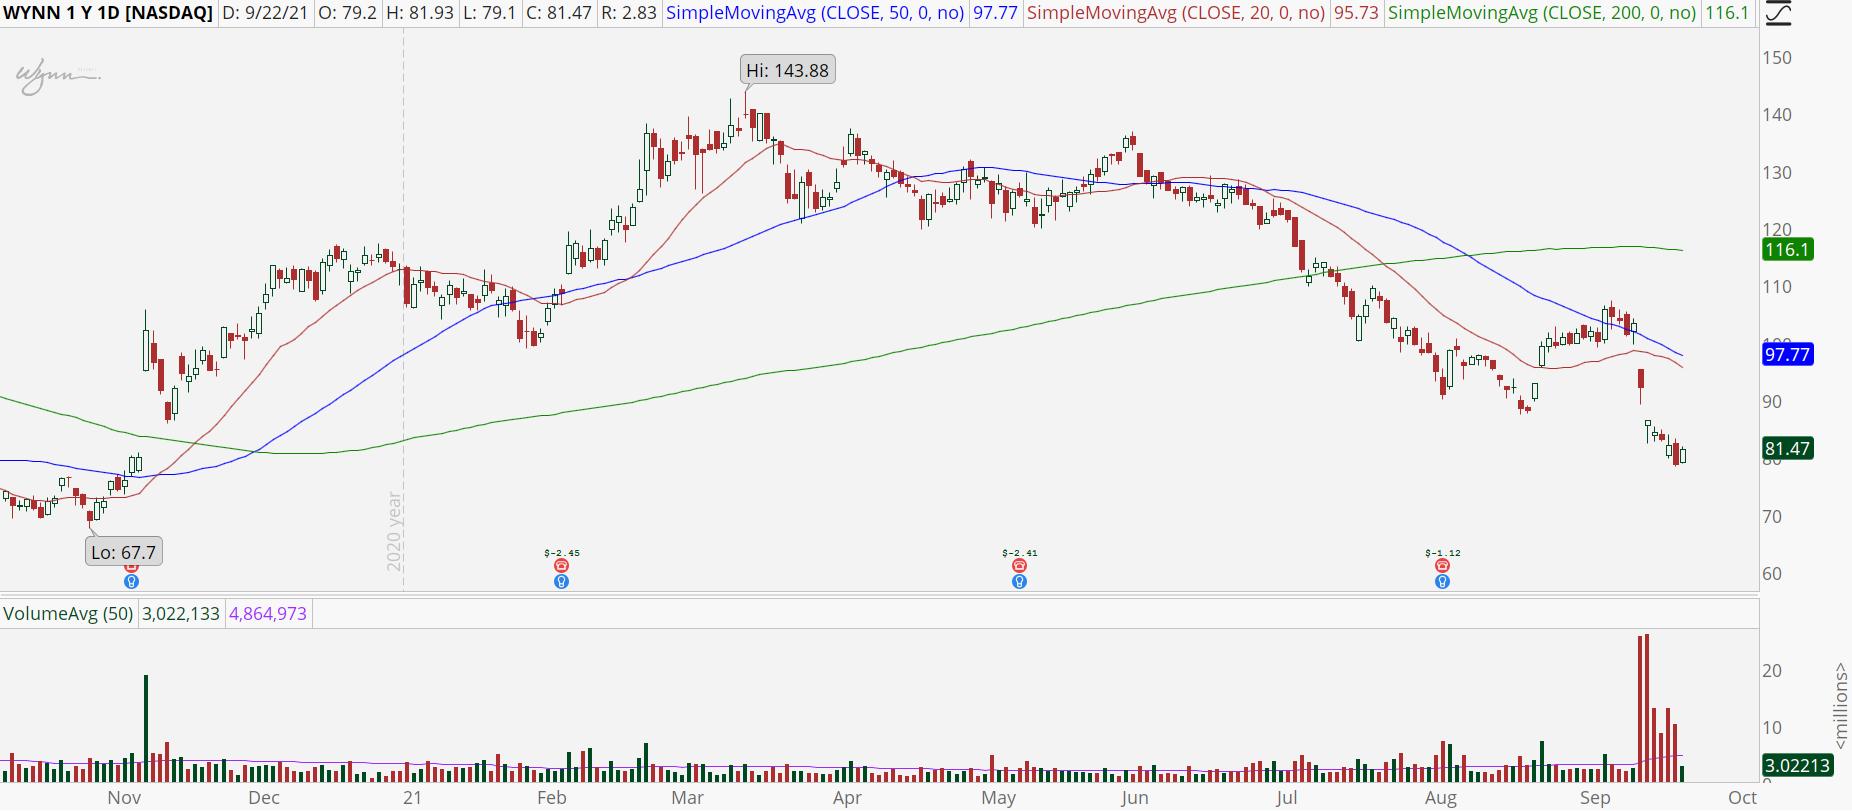 Wynn Resorts (WYNN) stock chart with bearish downtrend